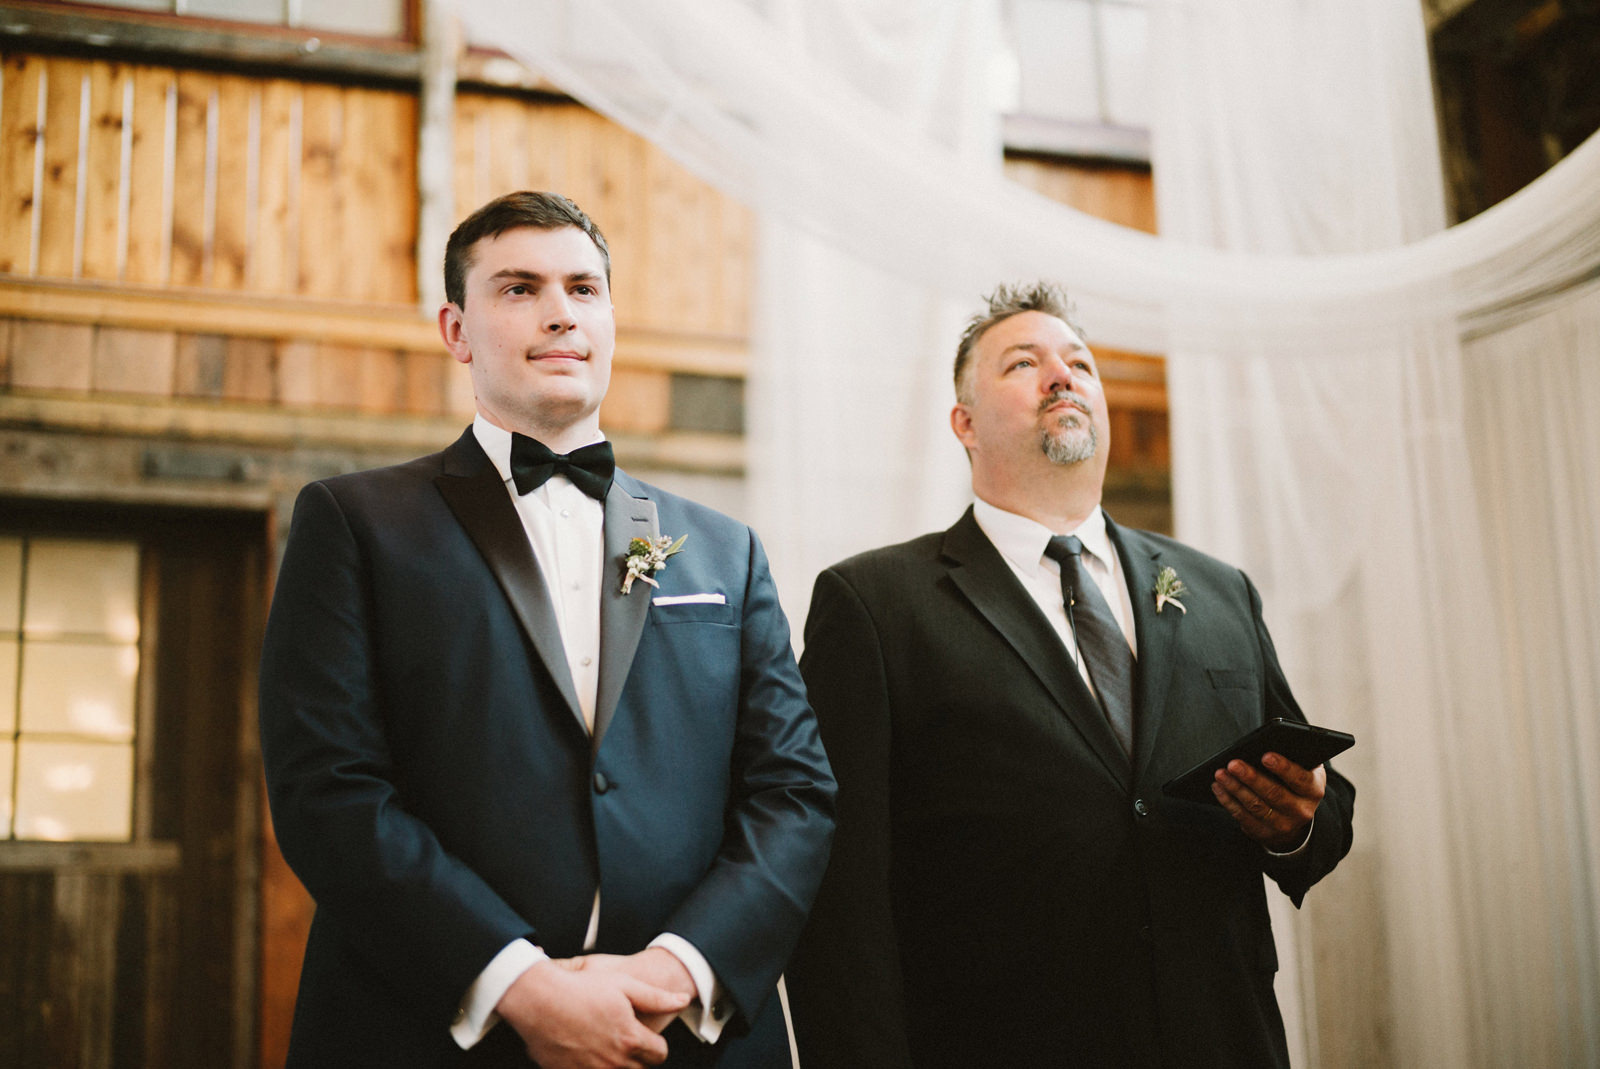 sodo-park-wedding-033 SODO PARK WEDDING